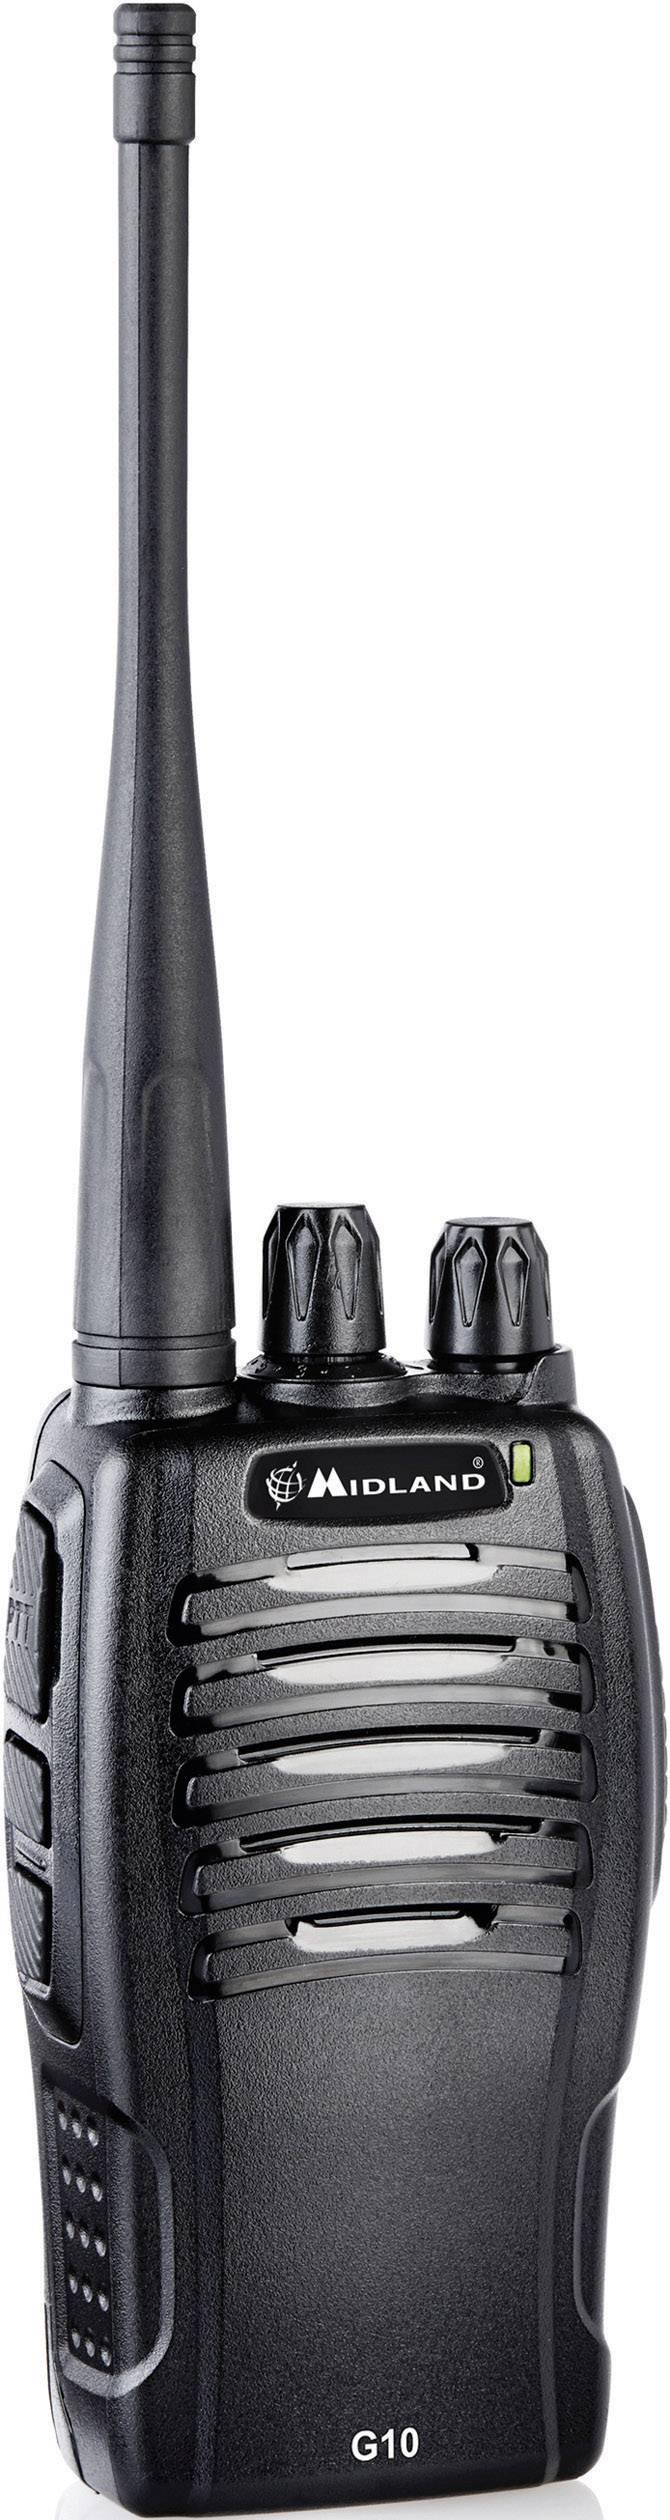 PMR rádiostanica Midland G10, C1107